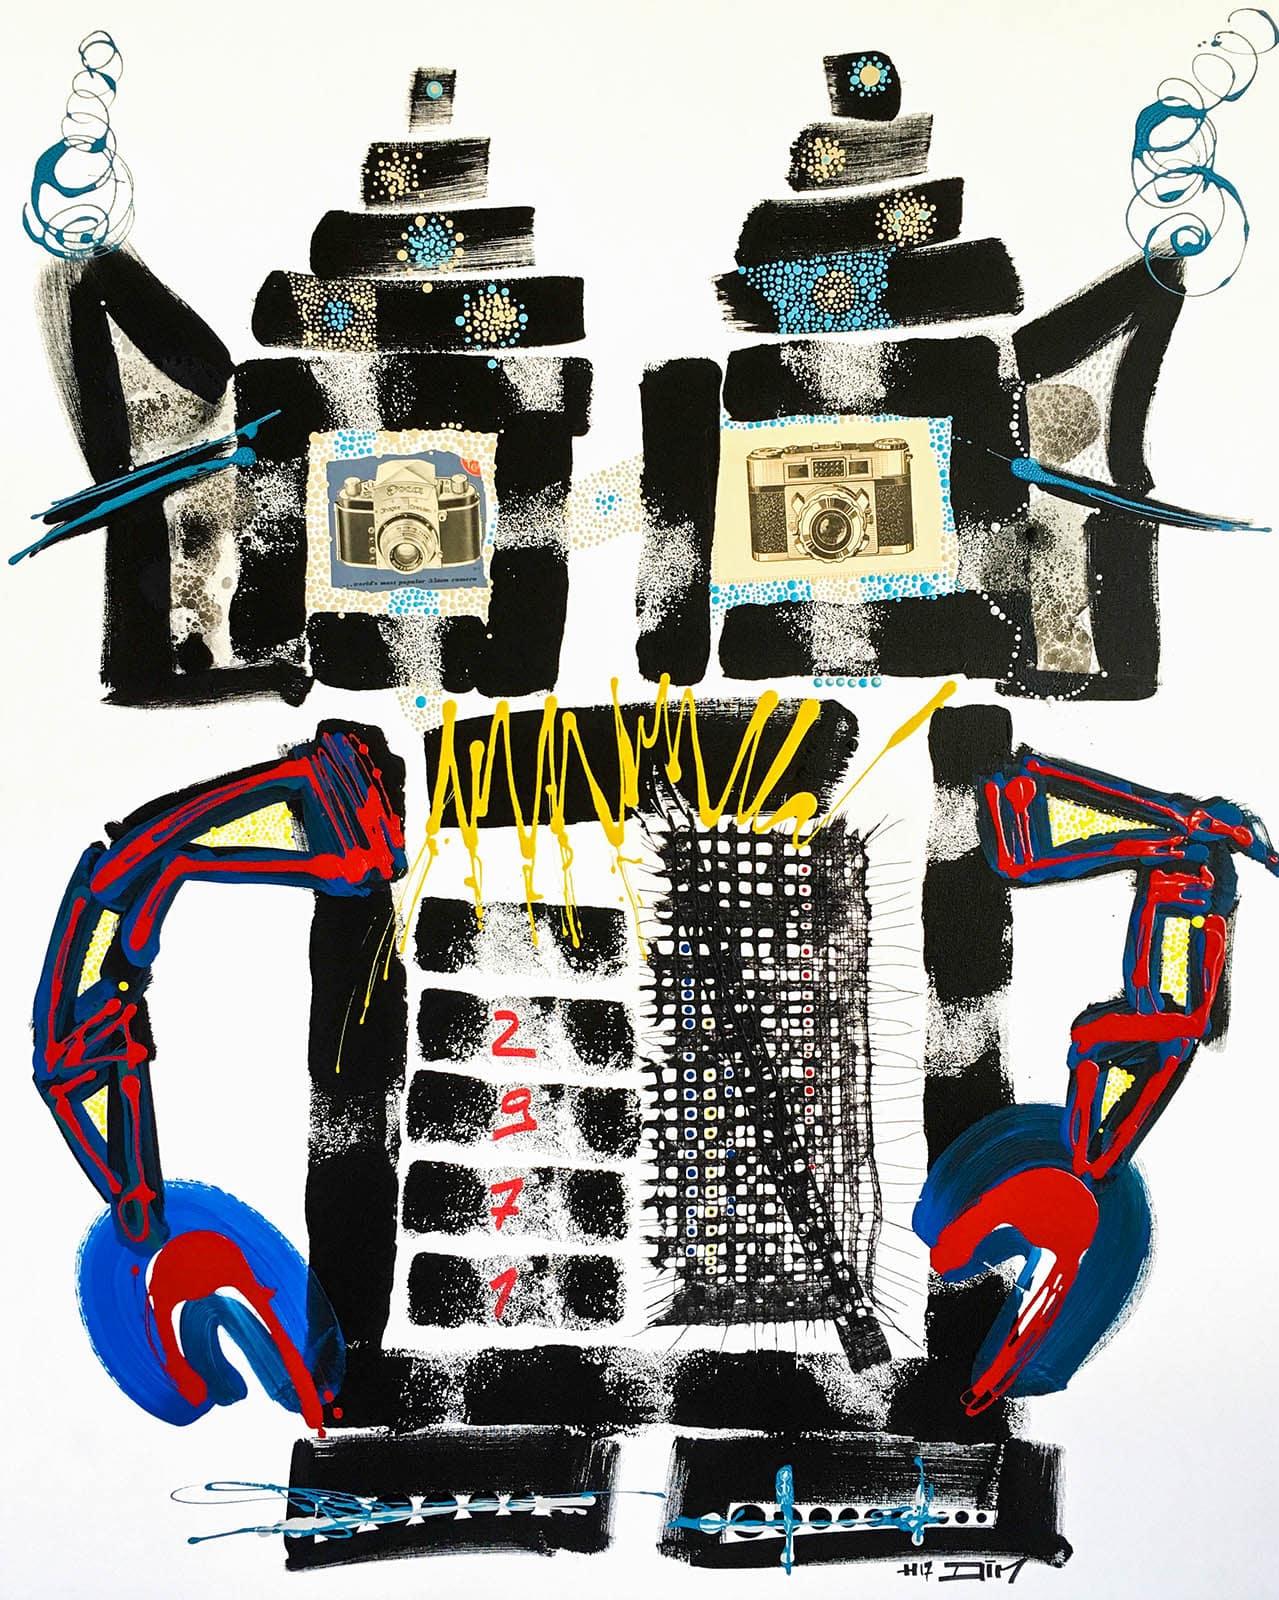 robot art gallery